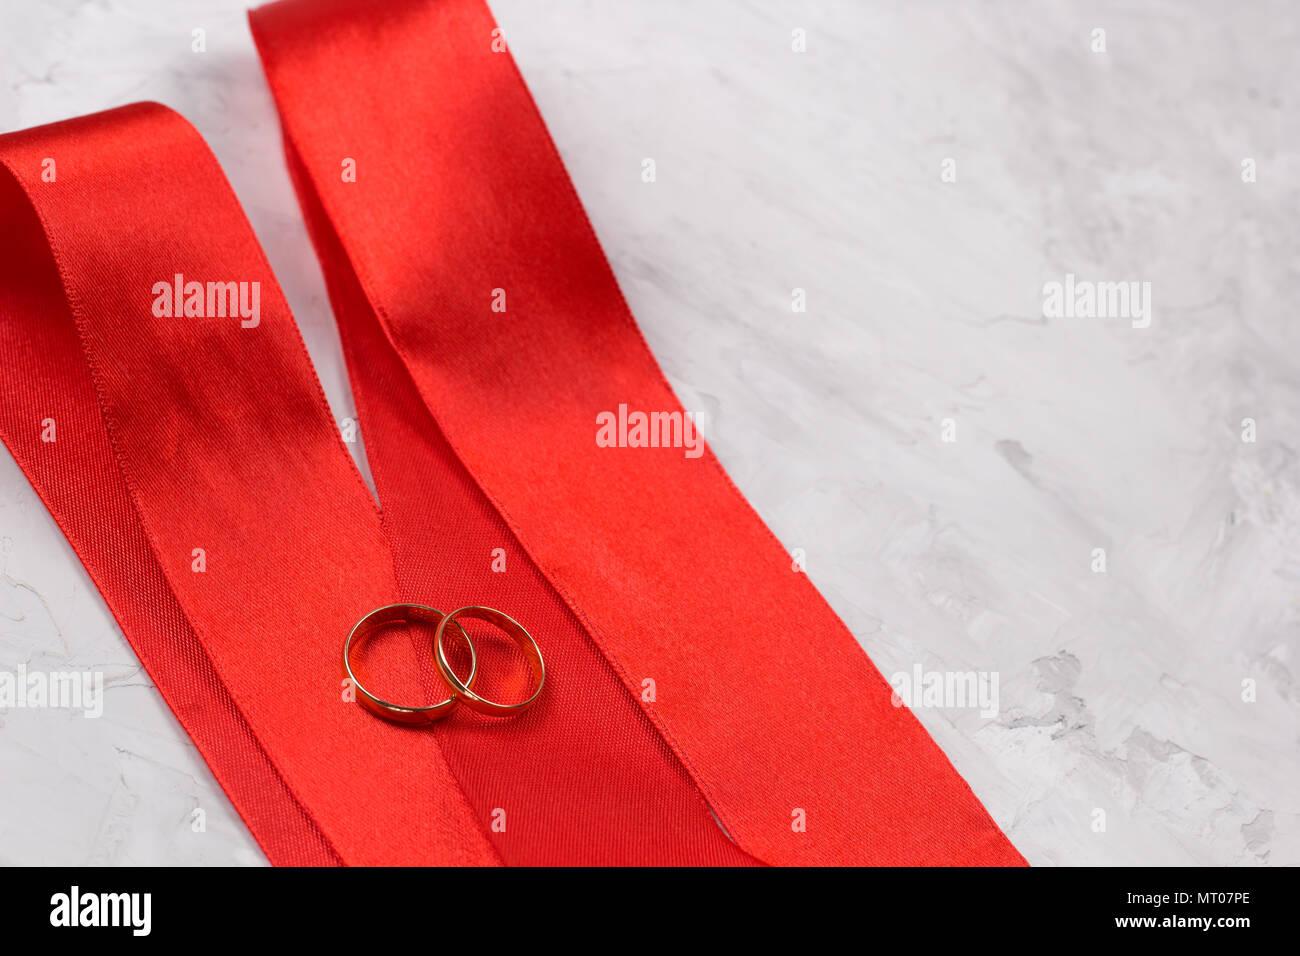 Amazing Wedding Invite Backgrounds Adornment - Invitations and ...